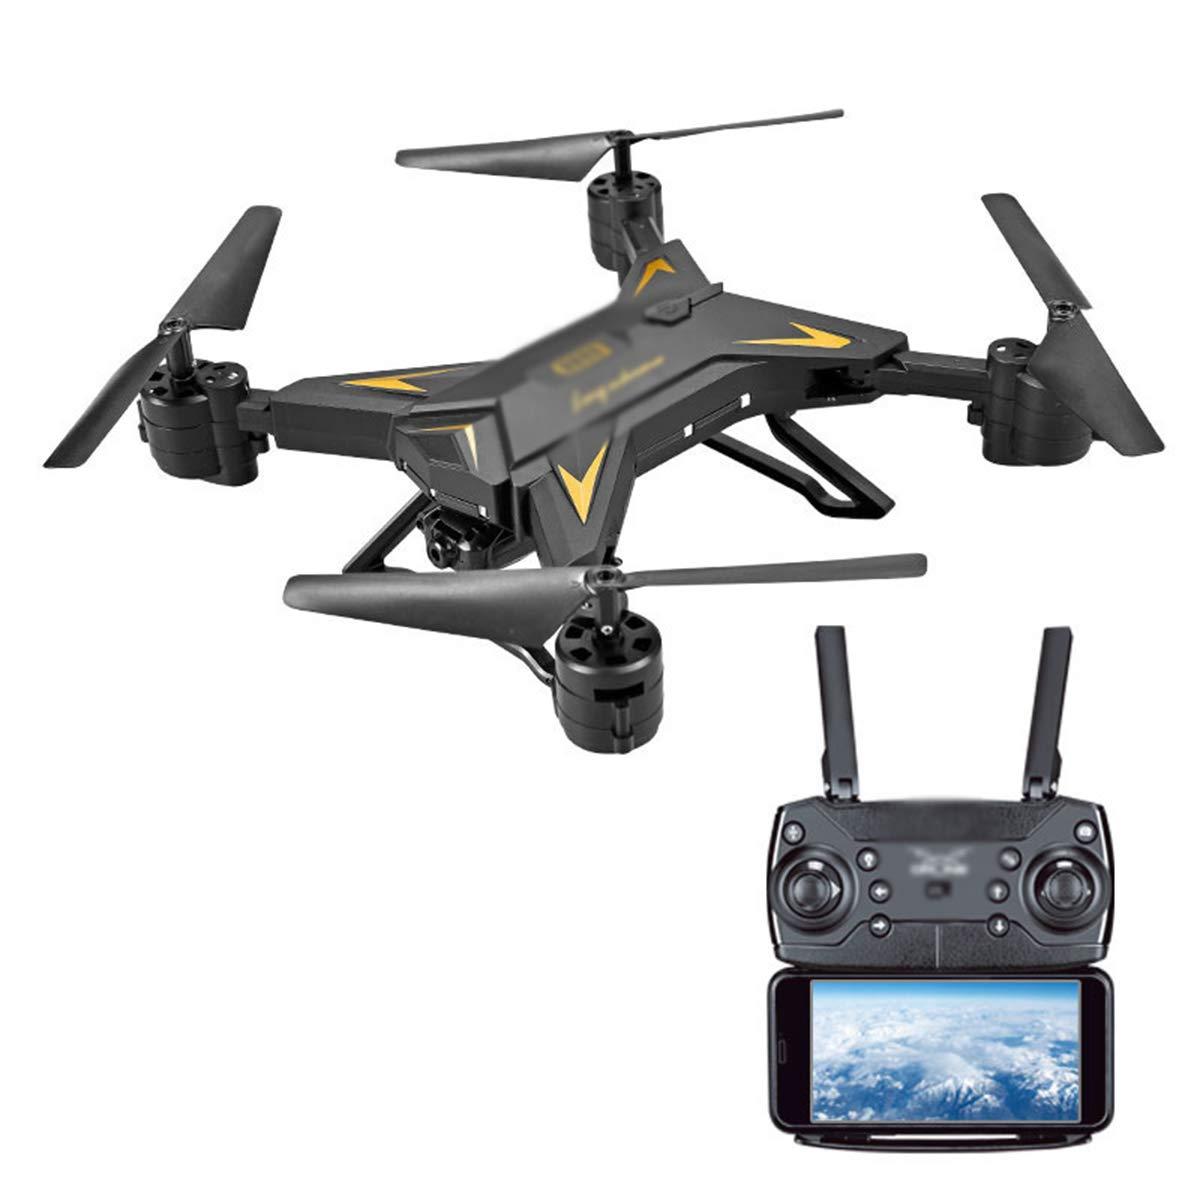 AEMAX Drone con cámara HD de 1080P, GPS Drone FPV RC, Video en Vivo con cámara de 1080P y GPS de Vuelta a casa con Quadcopter con cámara WiFi,Black 500W ...